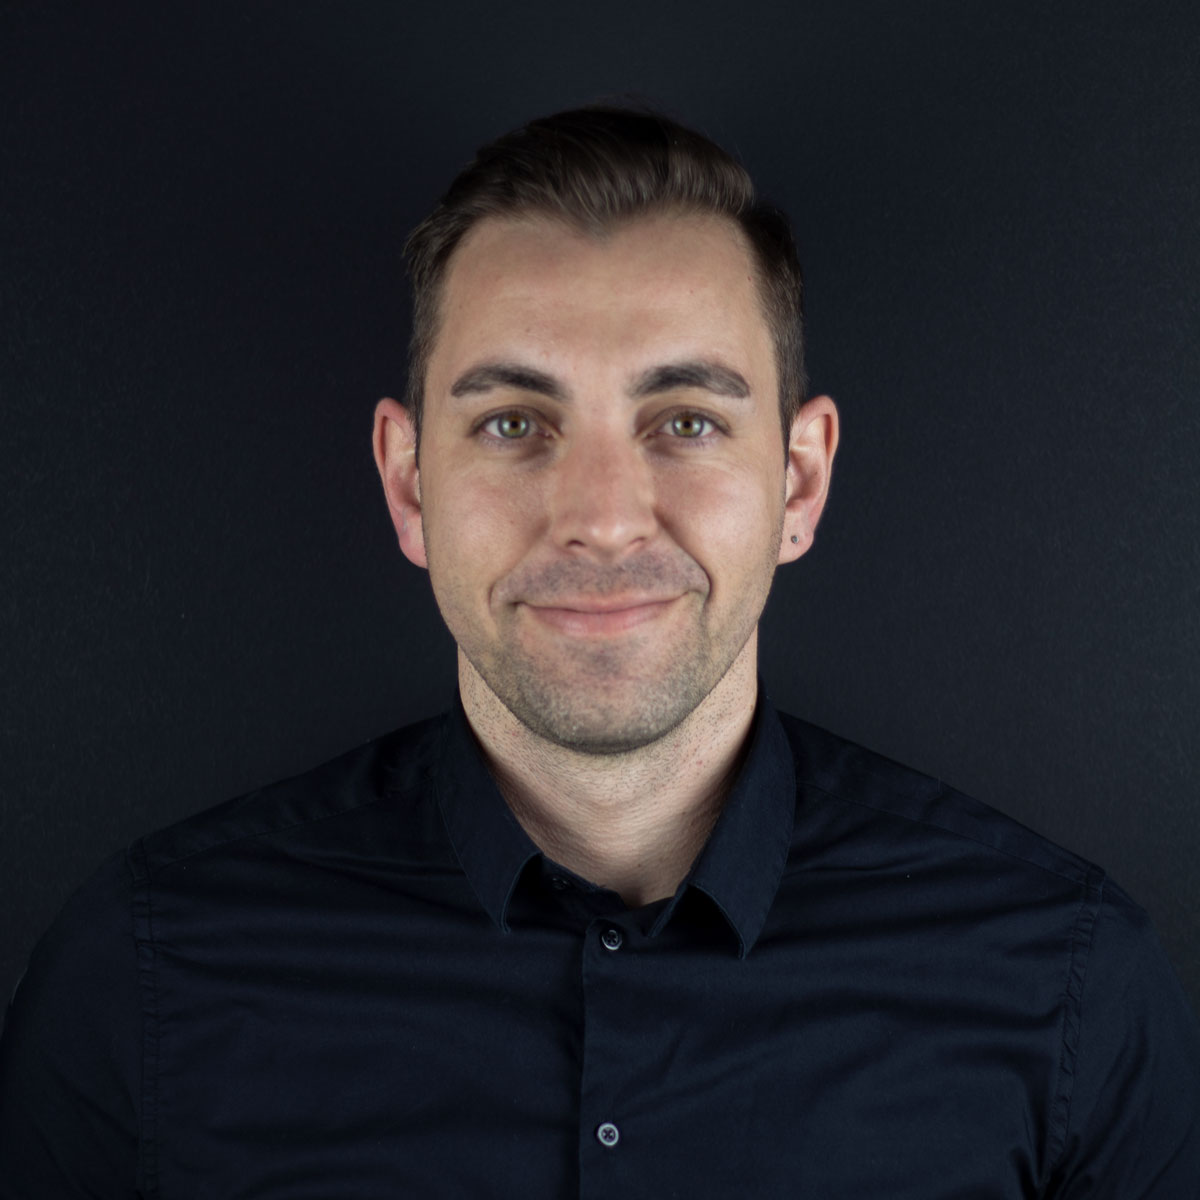 Dany Hammer, Geschäftsführer